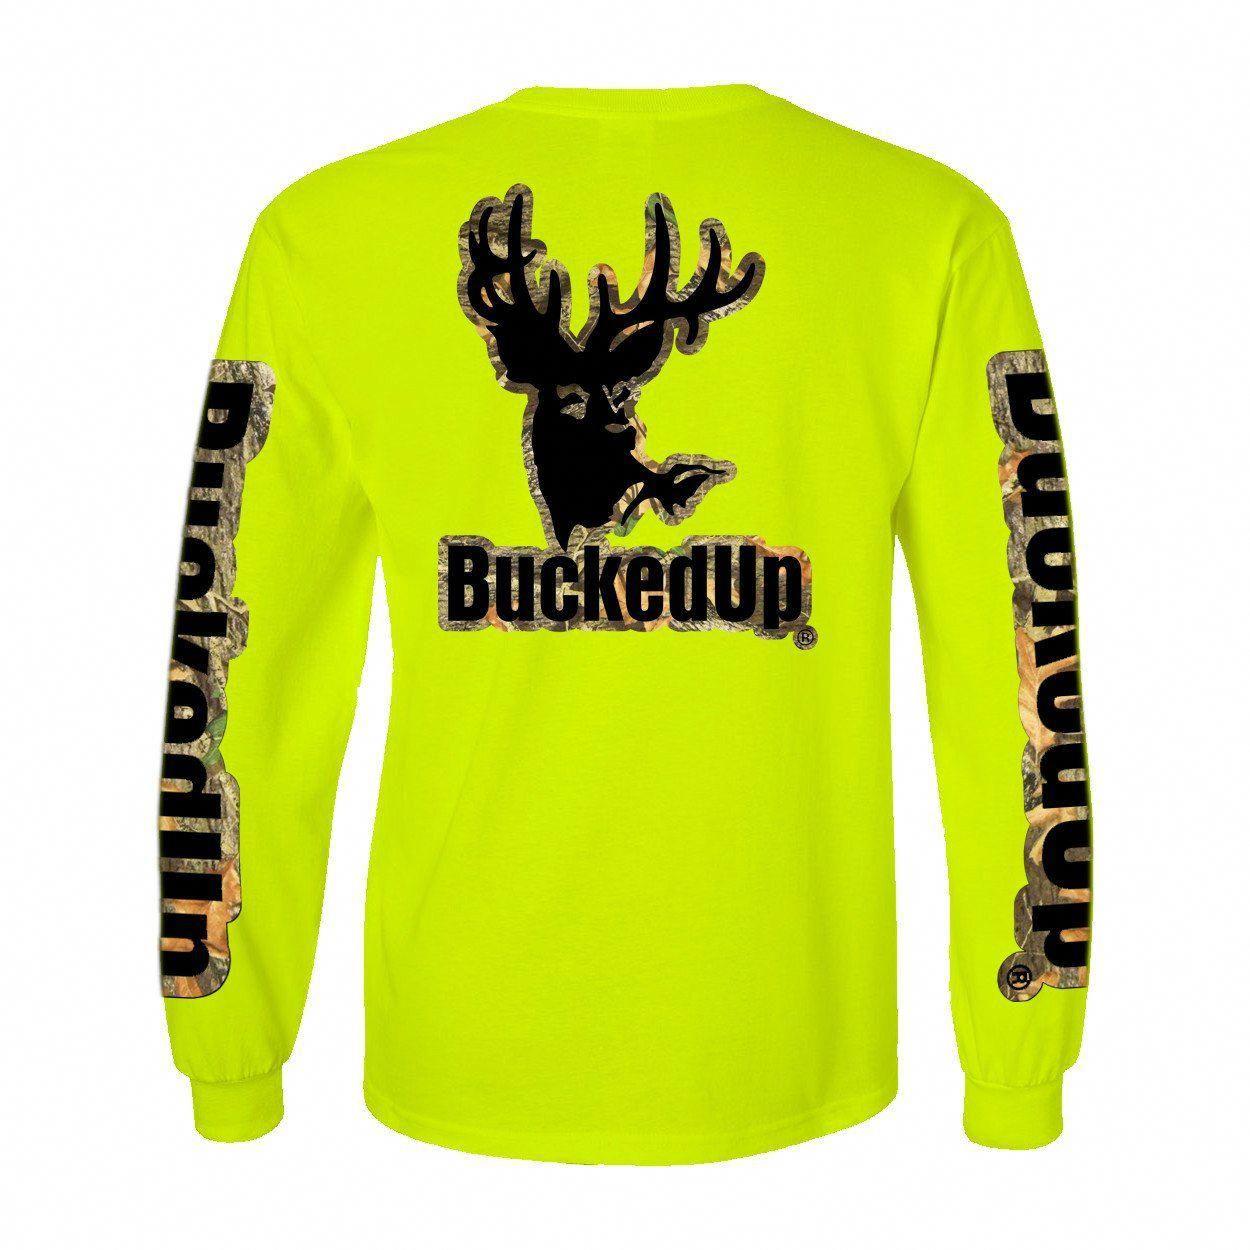 Hunting Clothes Hunting clothes, Long sleeve, Black logo